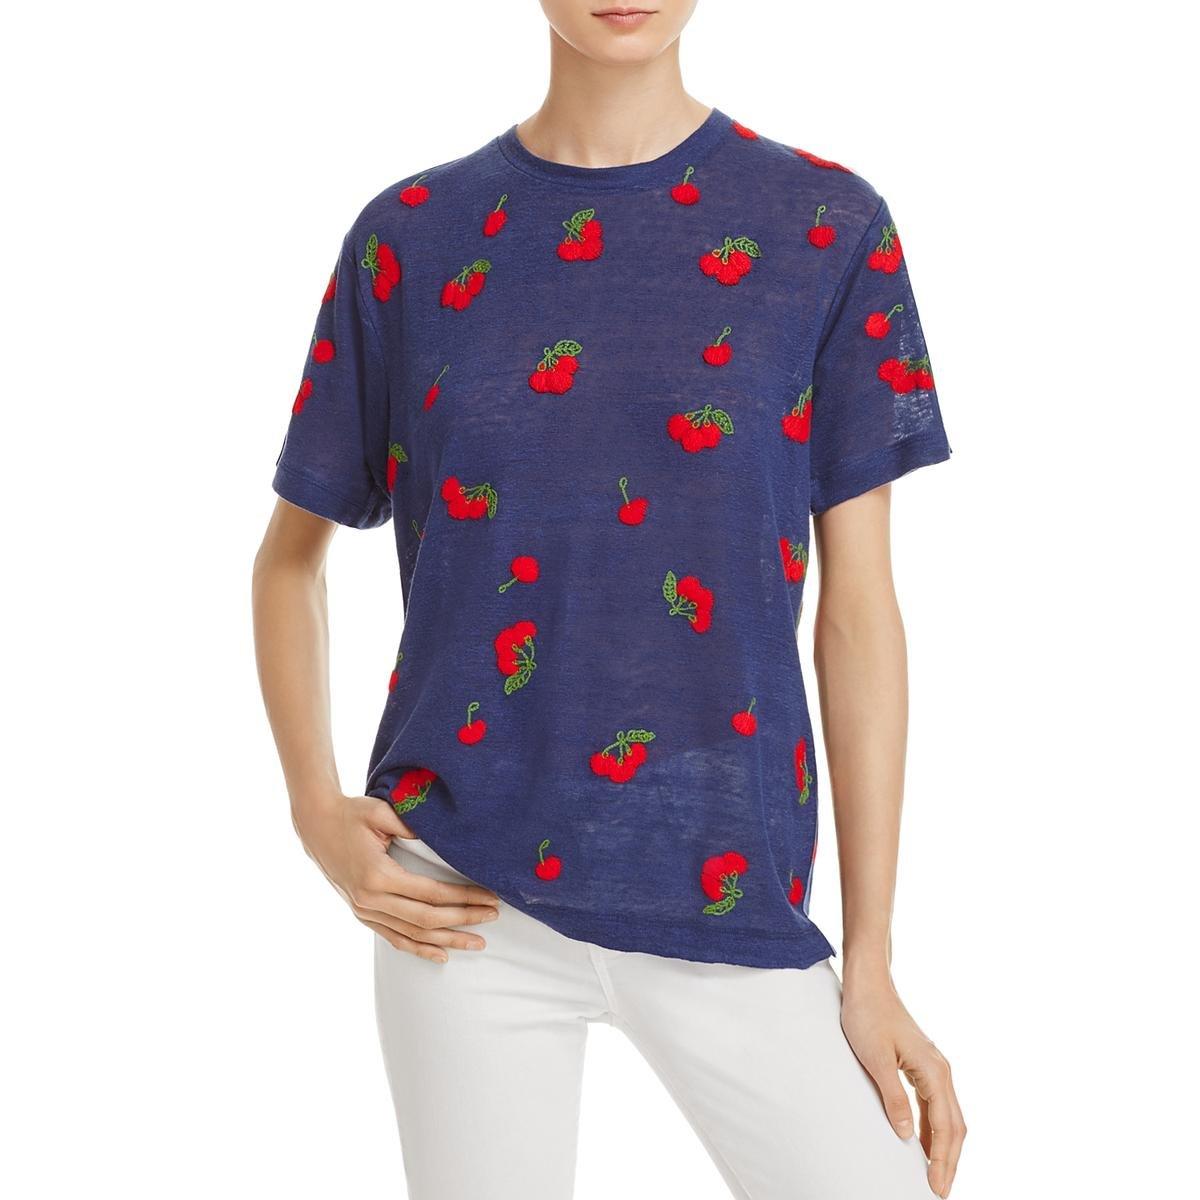 BannerDay Womens Linen Embroidered T-Shirt Navy M